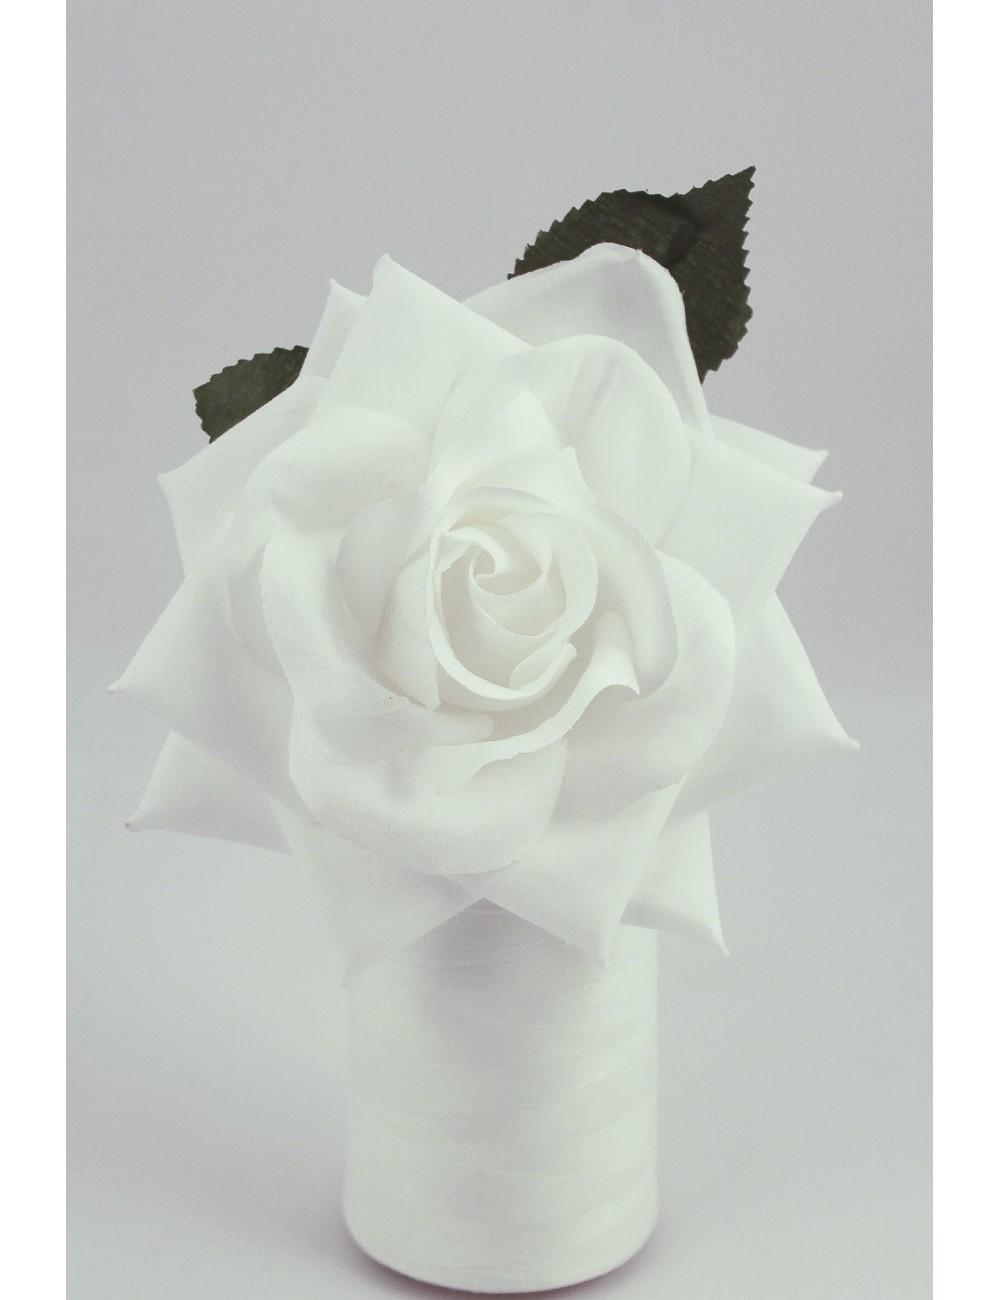 Rose de flamenco à tige 15 cm